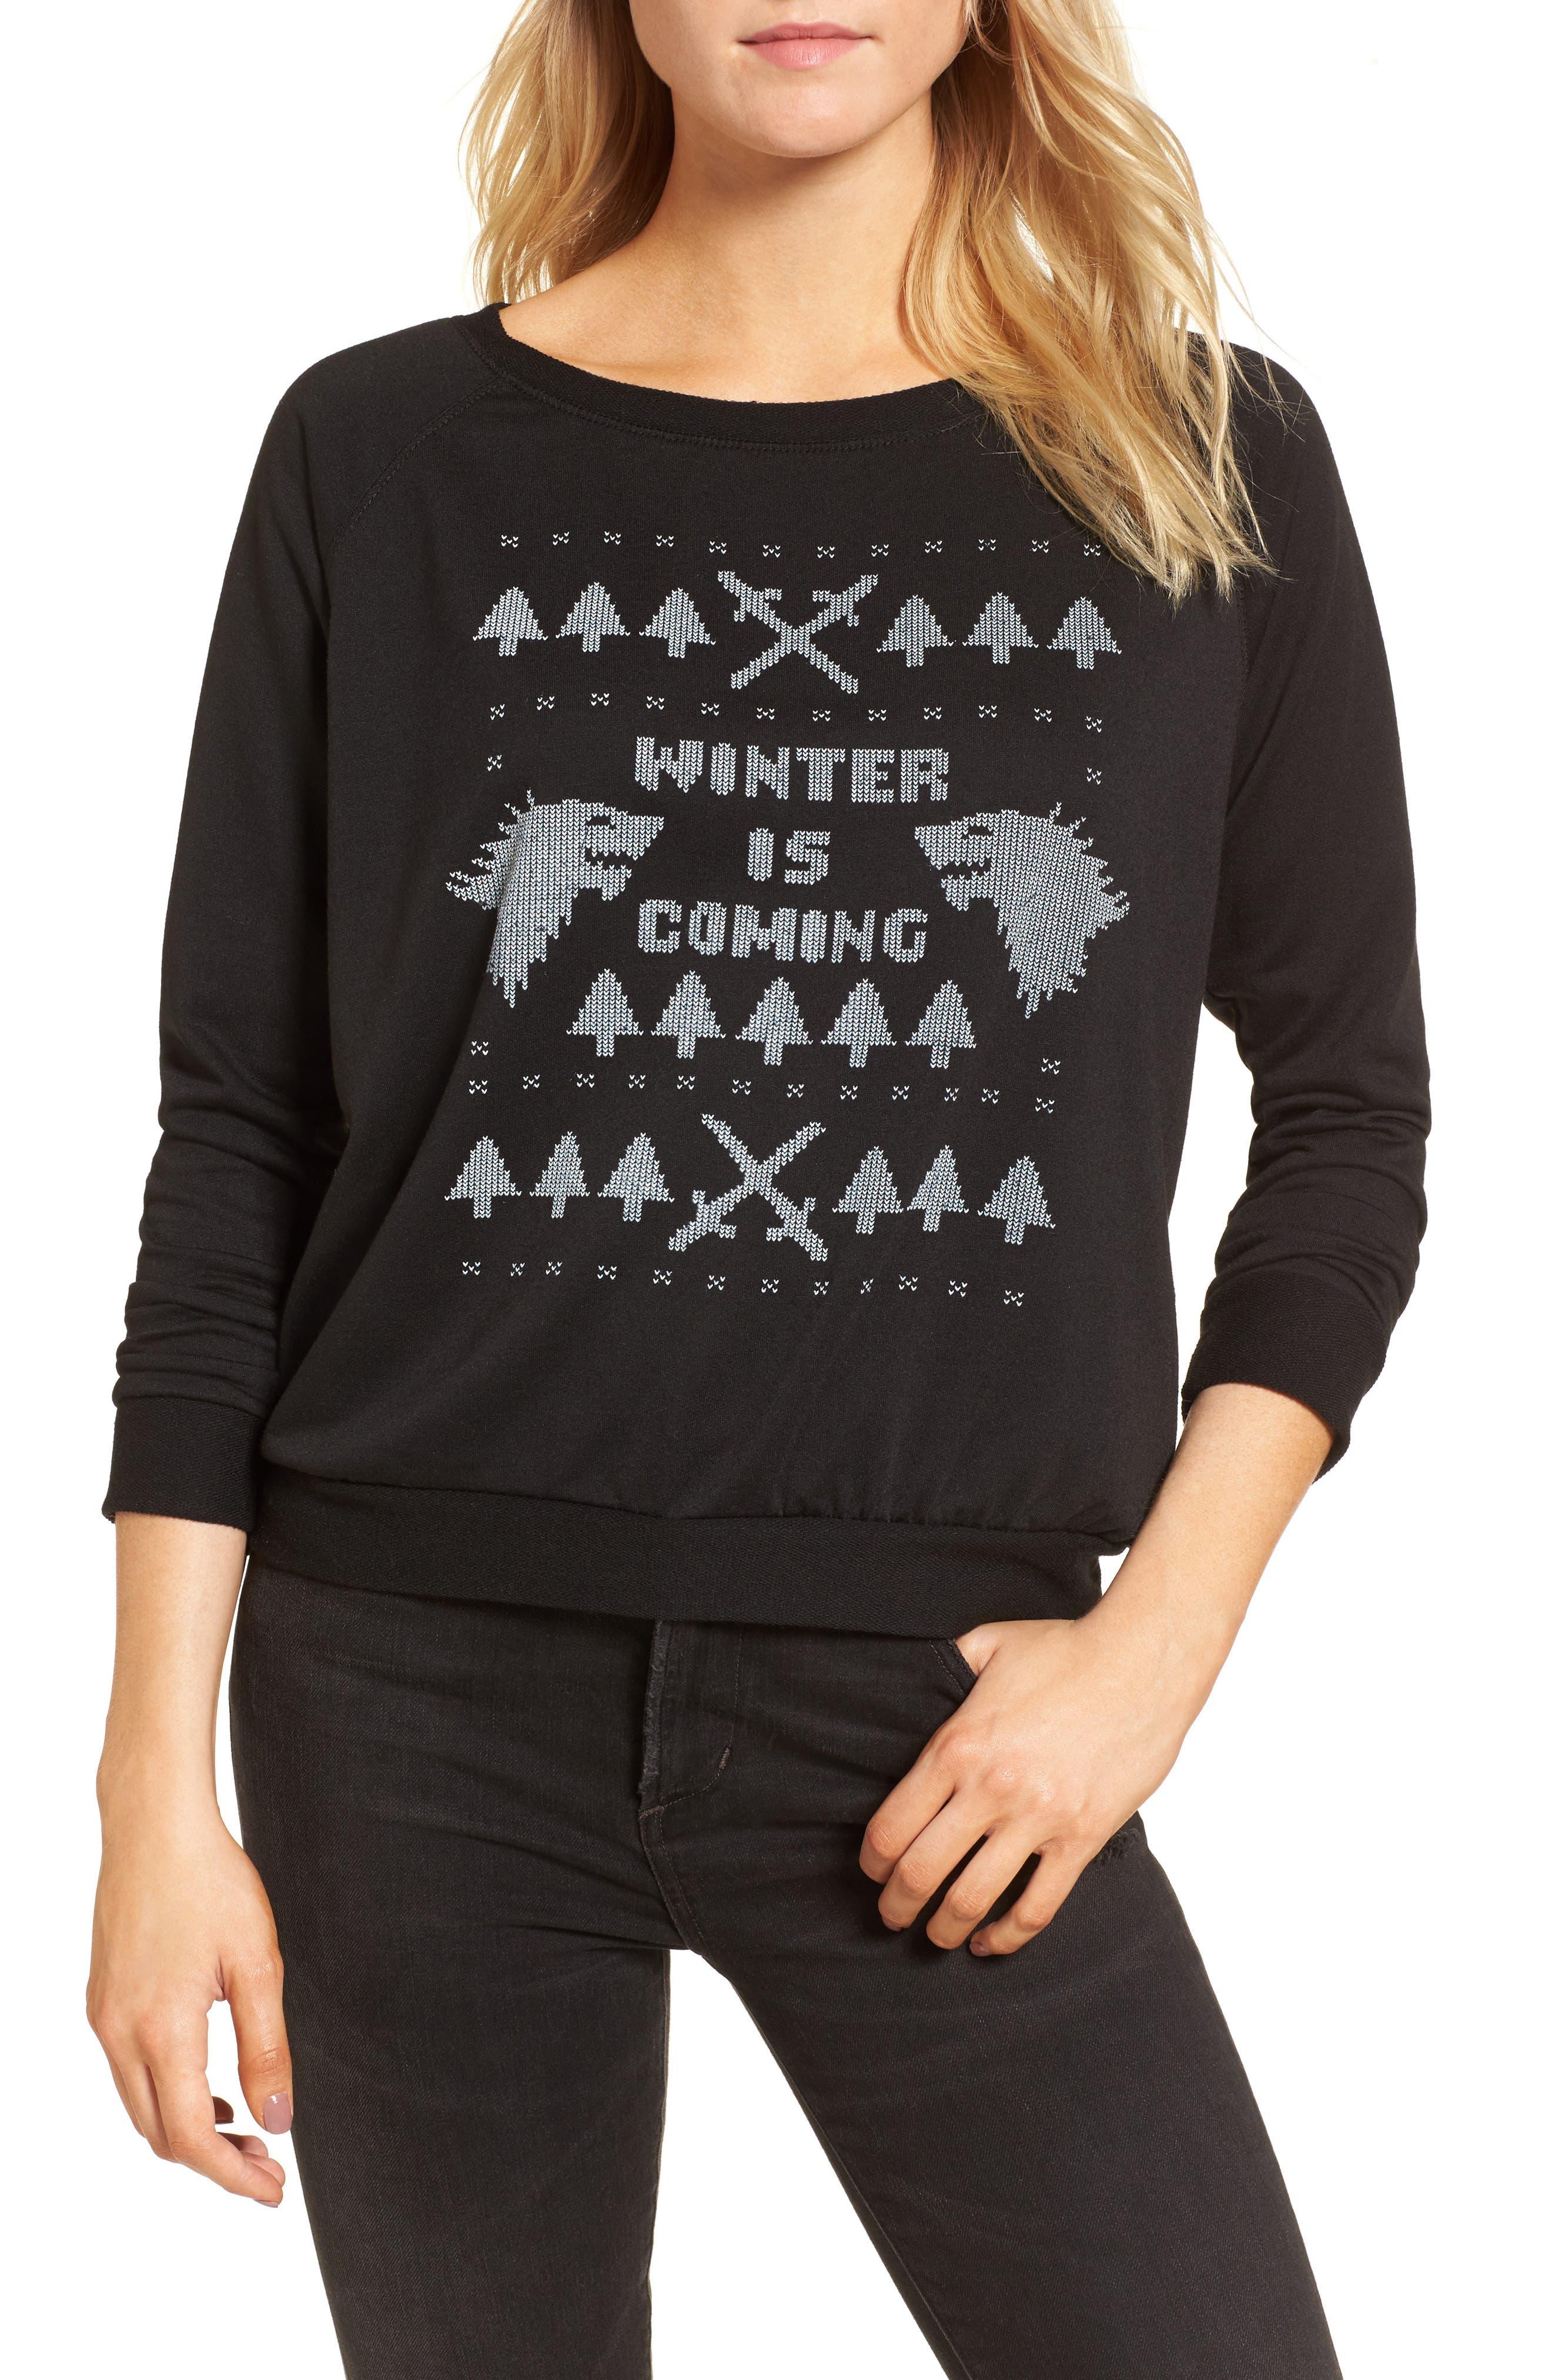 Winter Is Coming Sweatshirt,                             Main thumbnail 1, color,                             Black